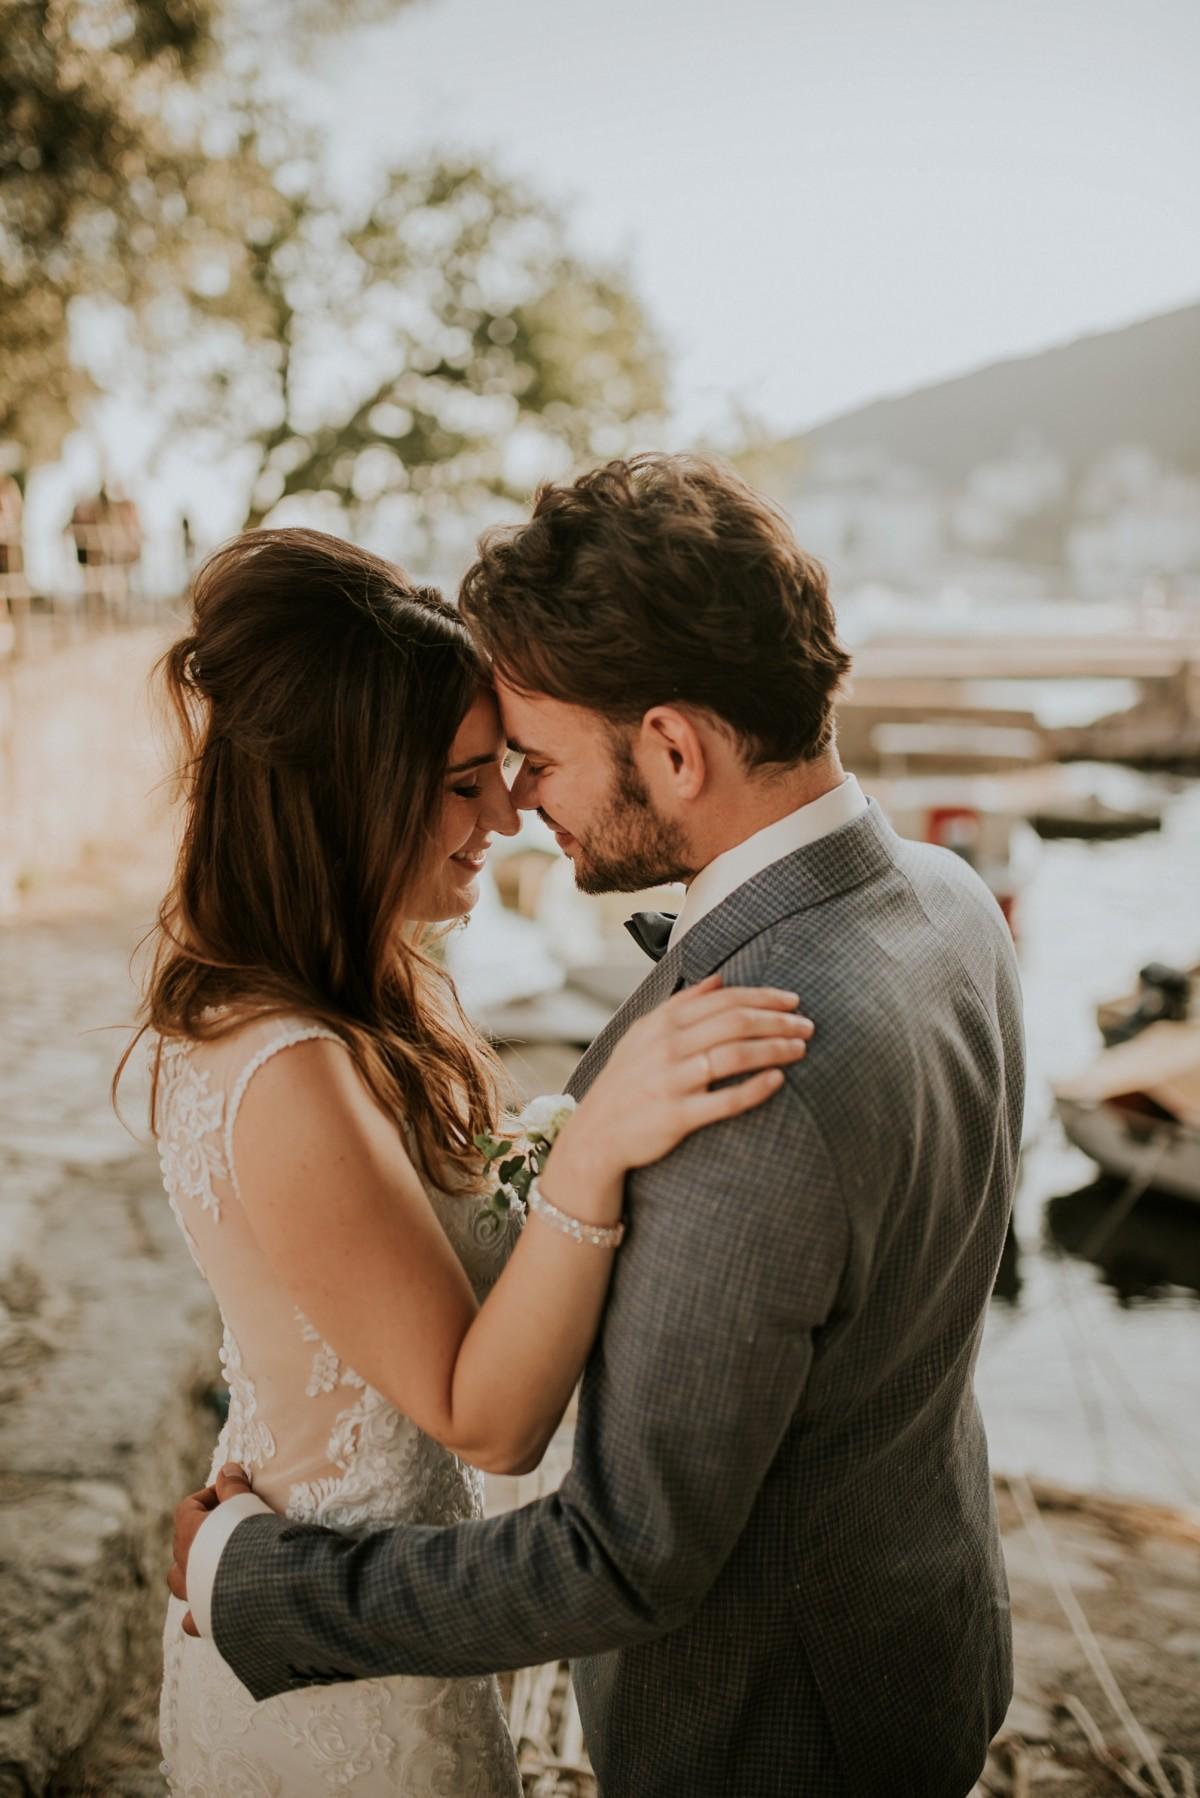 ariston_opatija_croatia_wedding_photographer_057.jpg